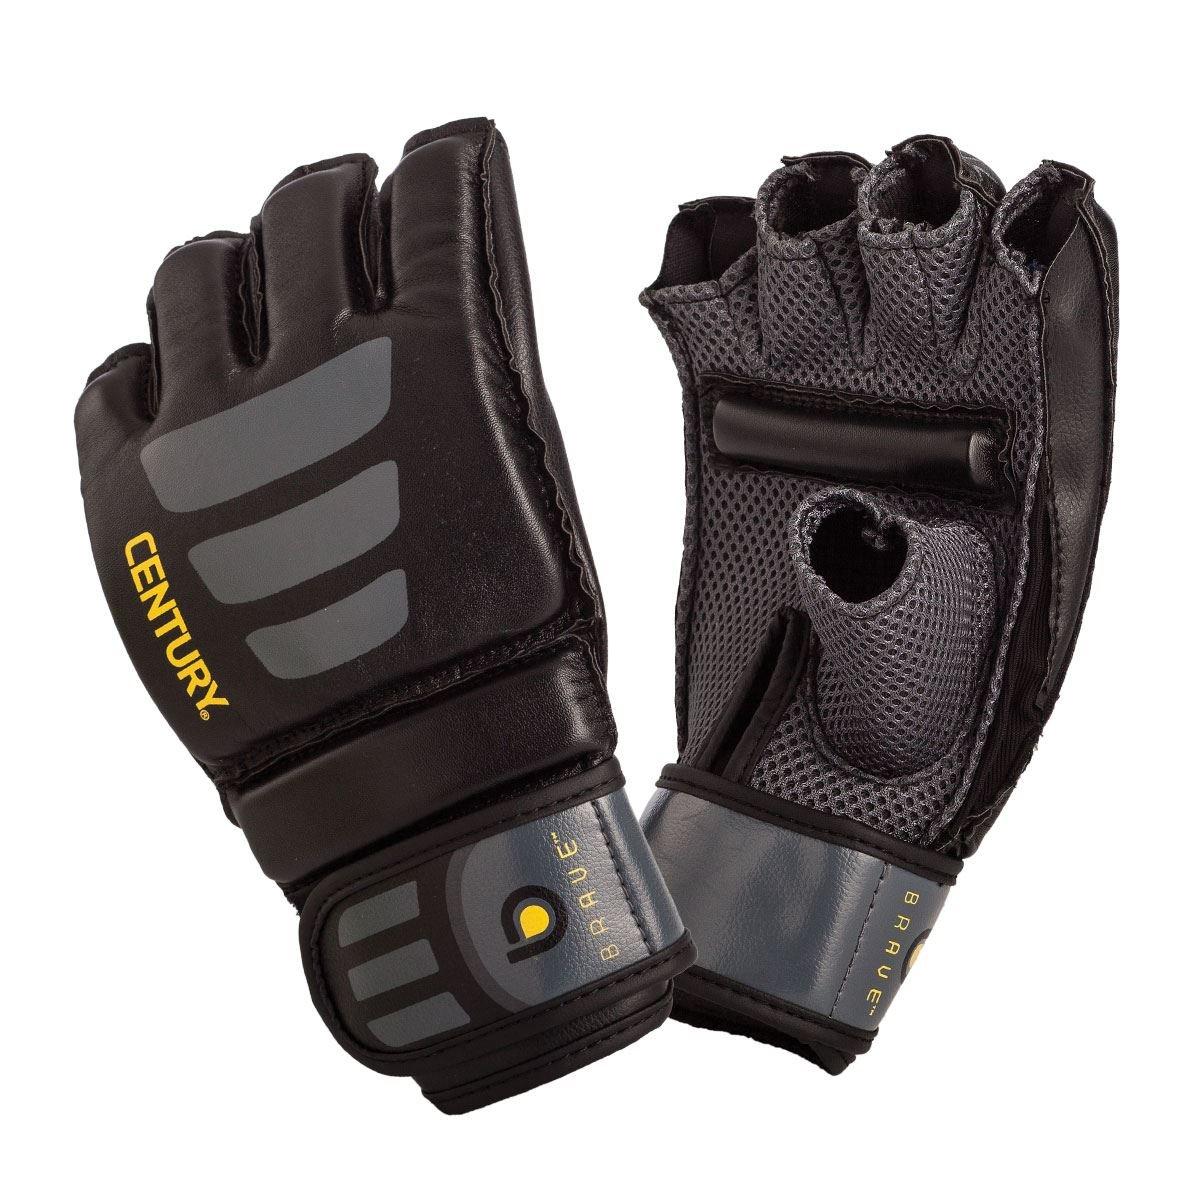 Amazon.com : Century Brave Grip Bar Bag Glove : Sports & Outdoors